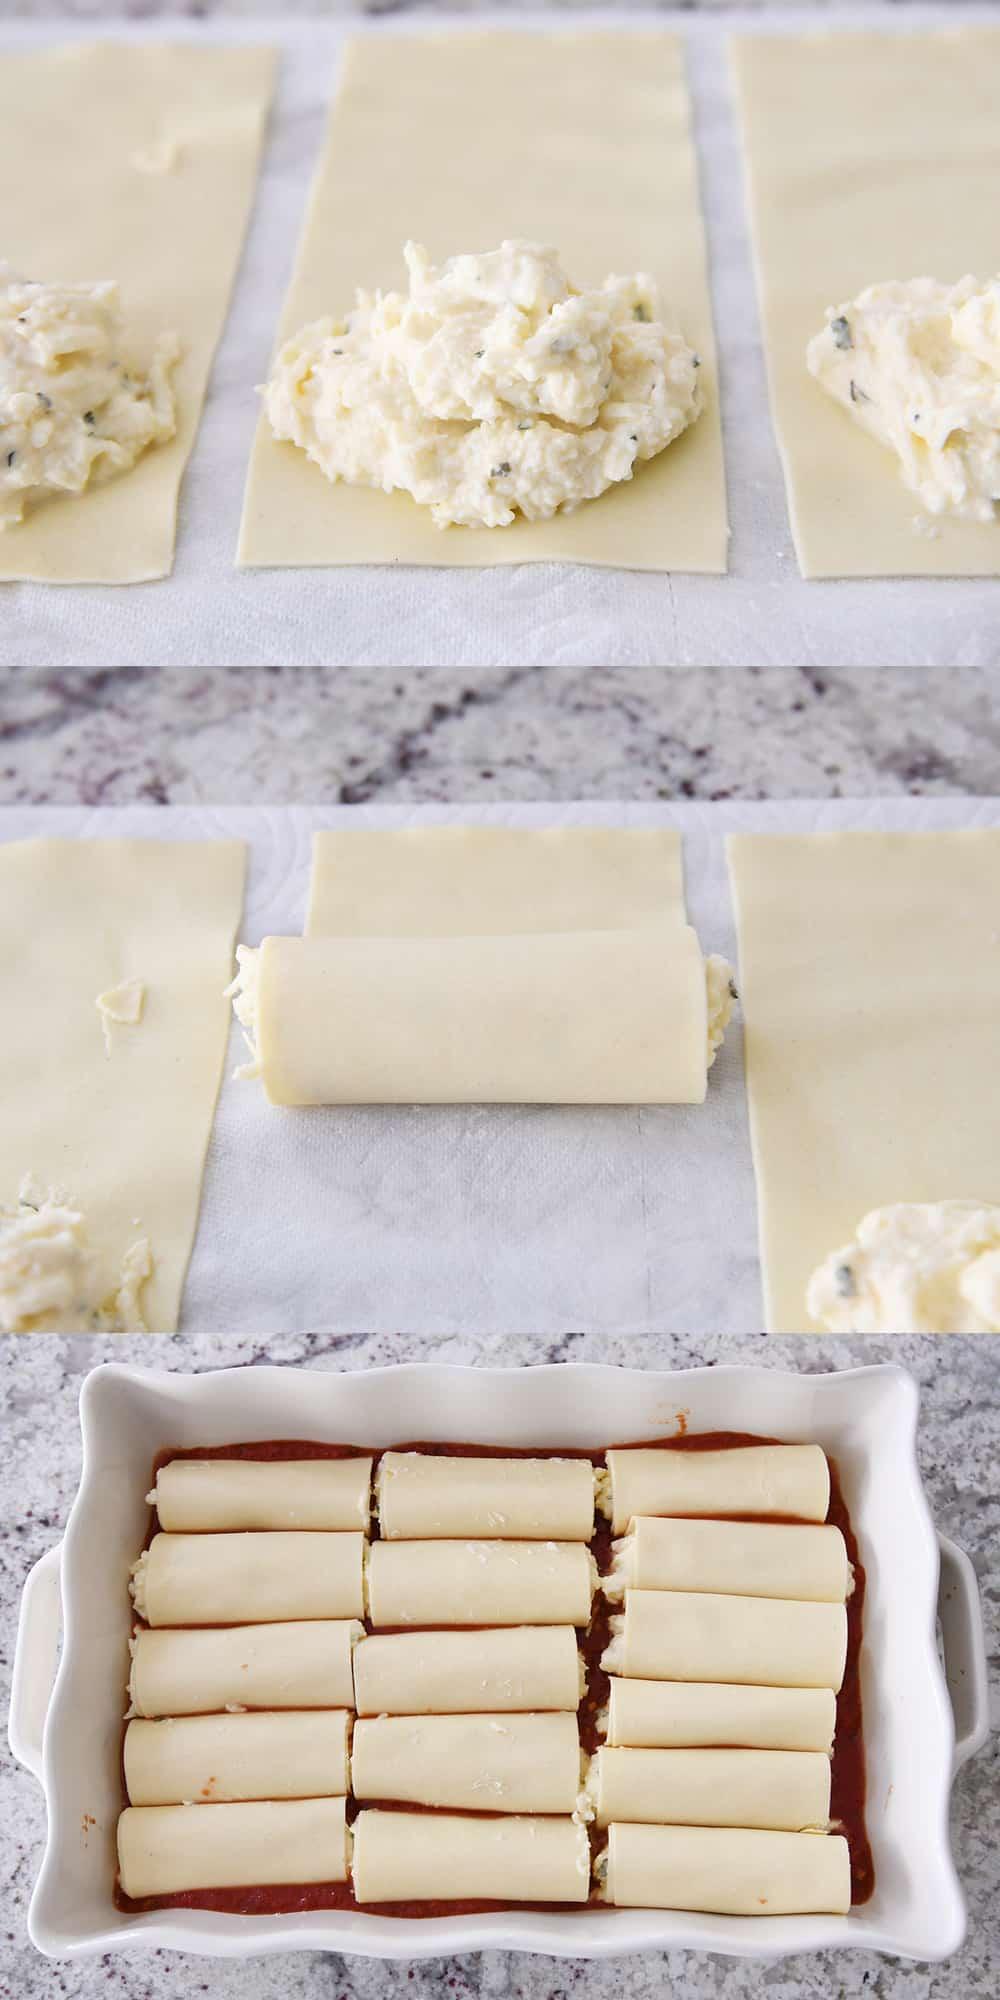 rolling up manicotti shells with cheesy ricotta filling